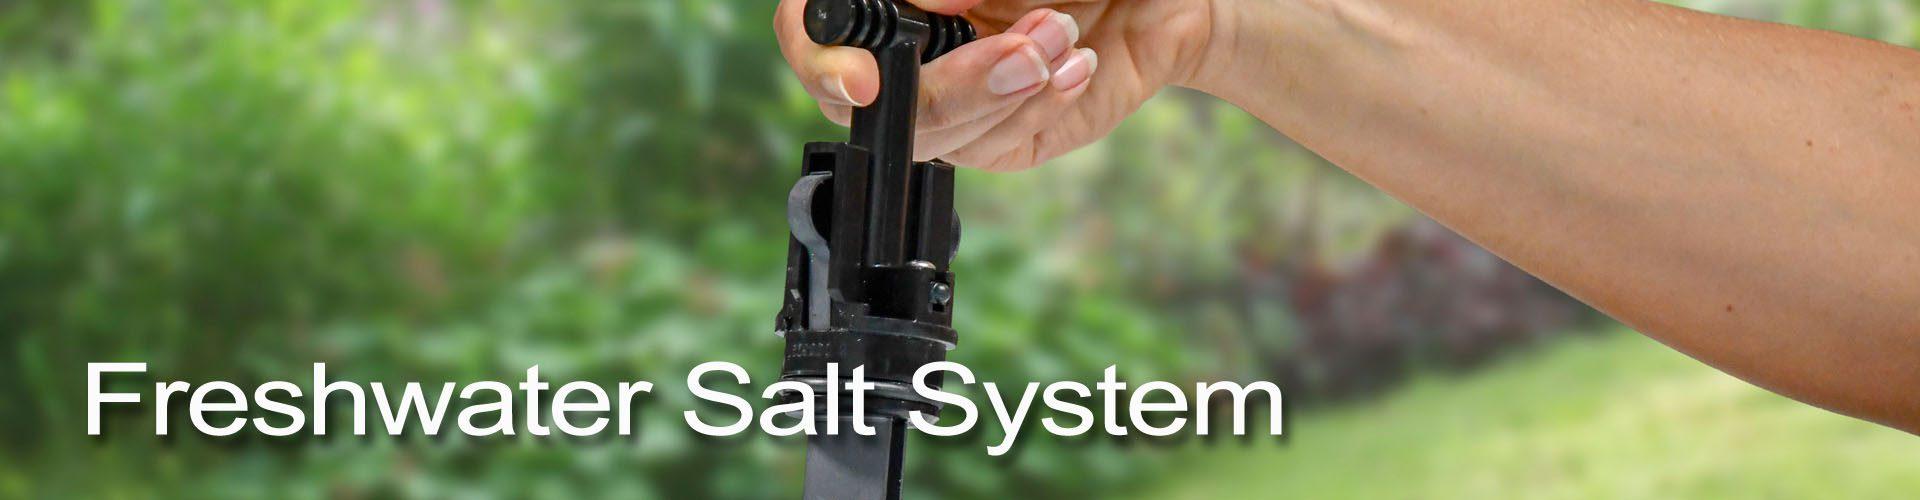 freshwater-salt-system-